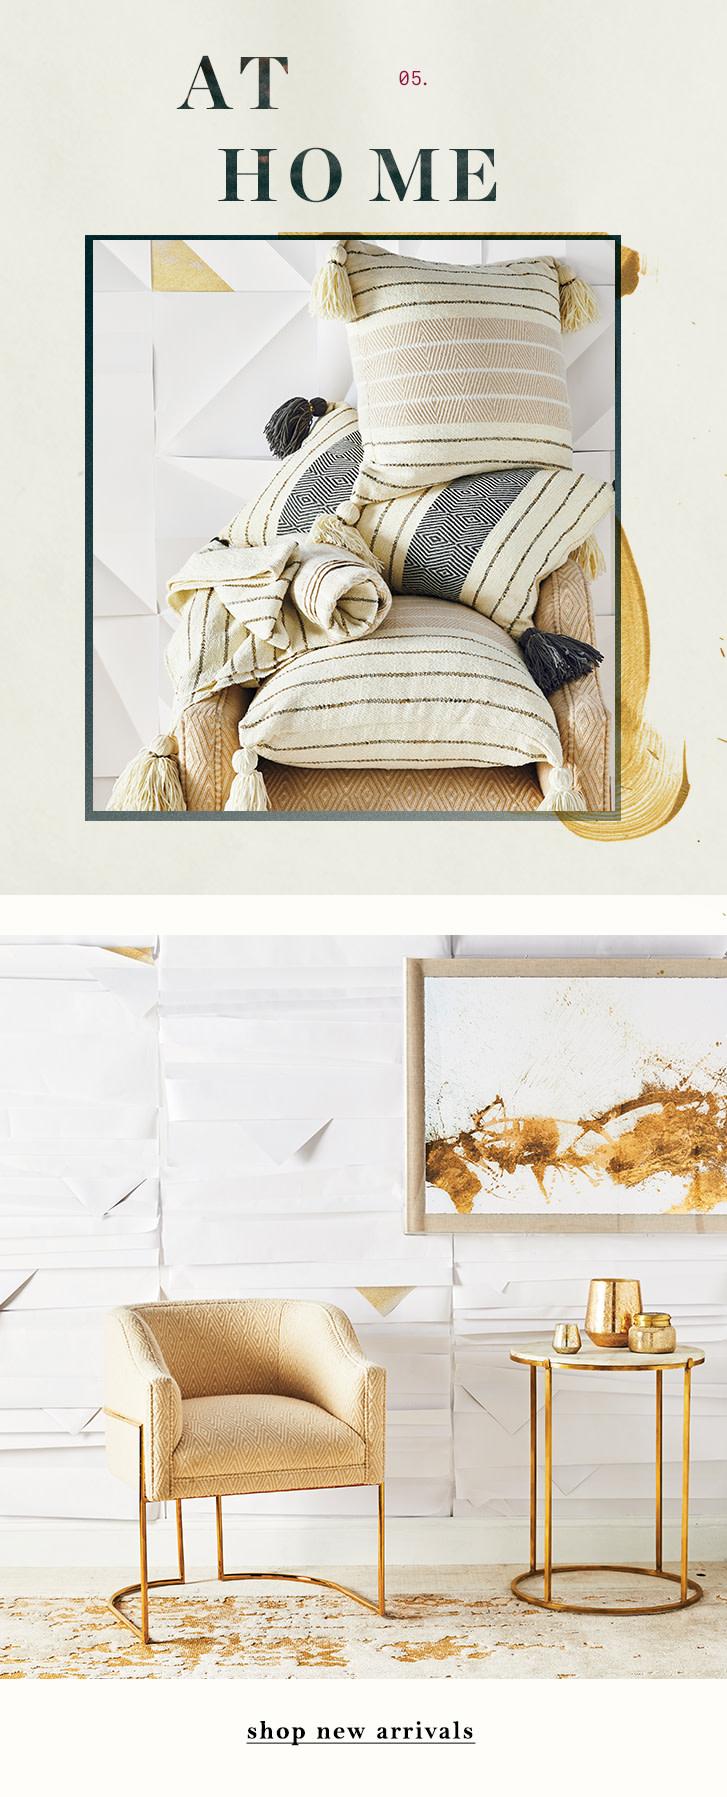 Stunning Mr Price Home Design Quarter Contemporary - Decorating ...